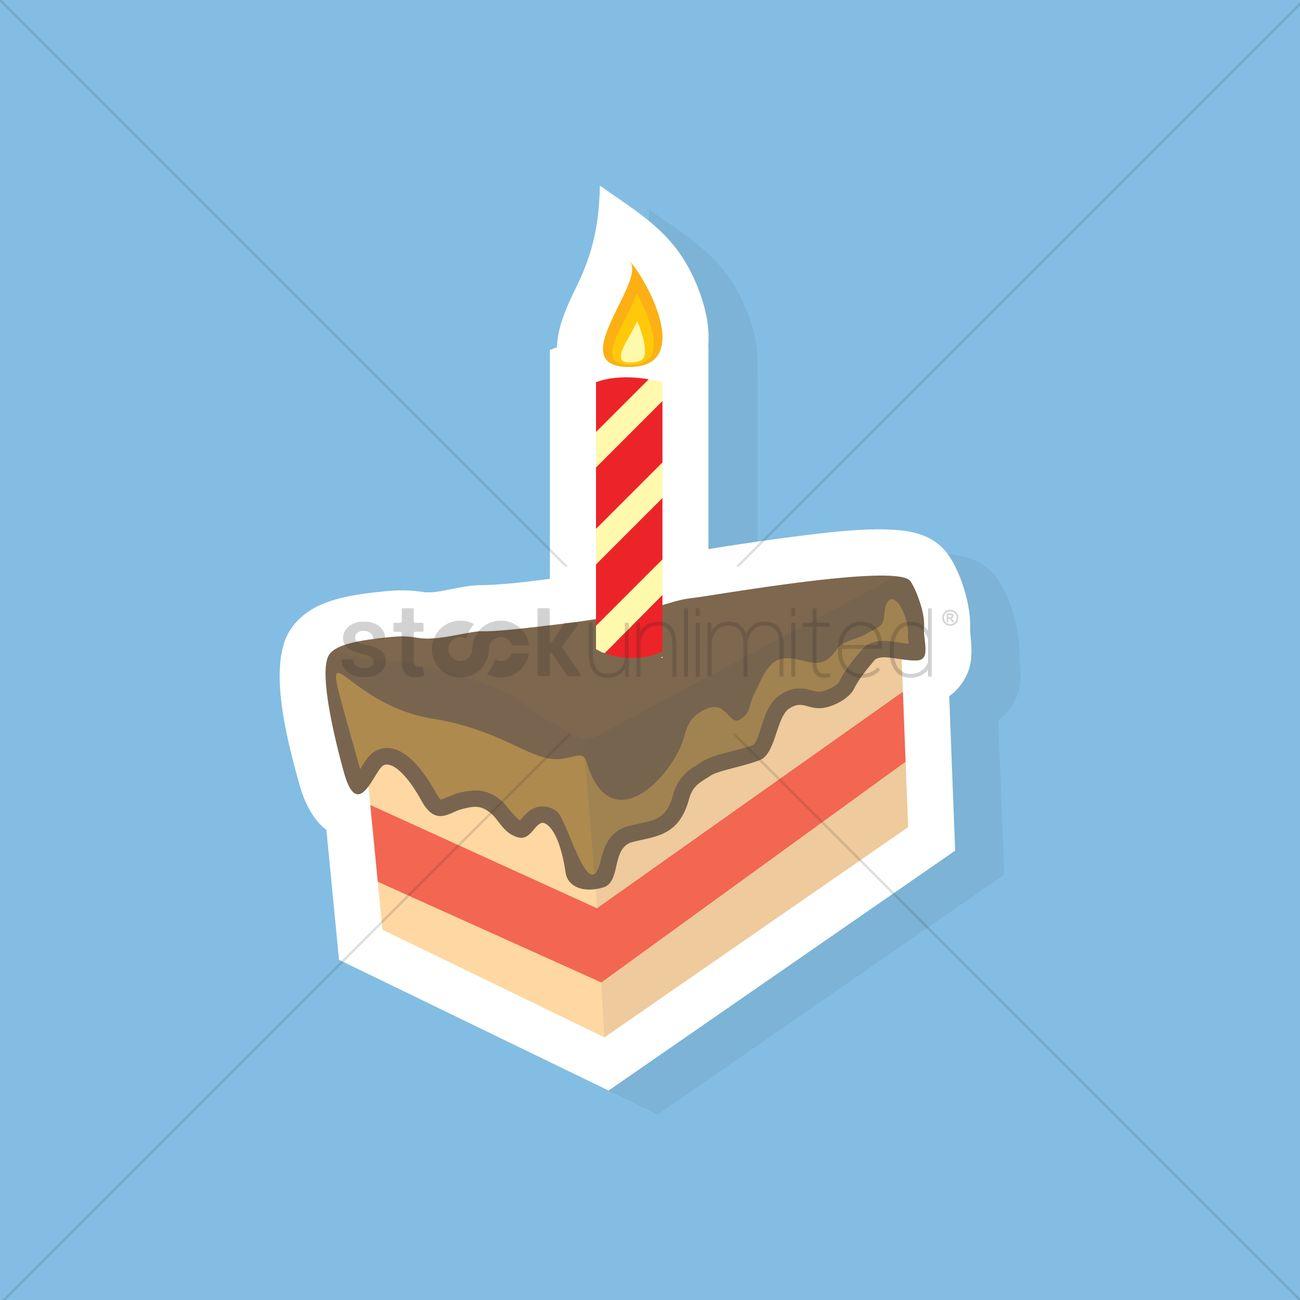 Strange Free A Slice Of Birthday Cake Vector Image 1242954 Stockunlimited Personalised Birthday Cards Paralily Jamesorg